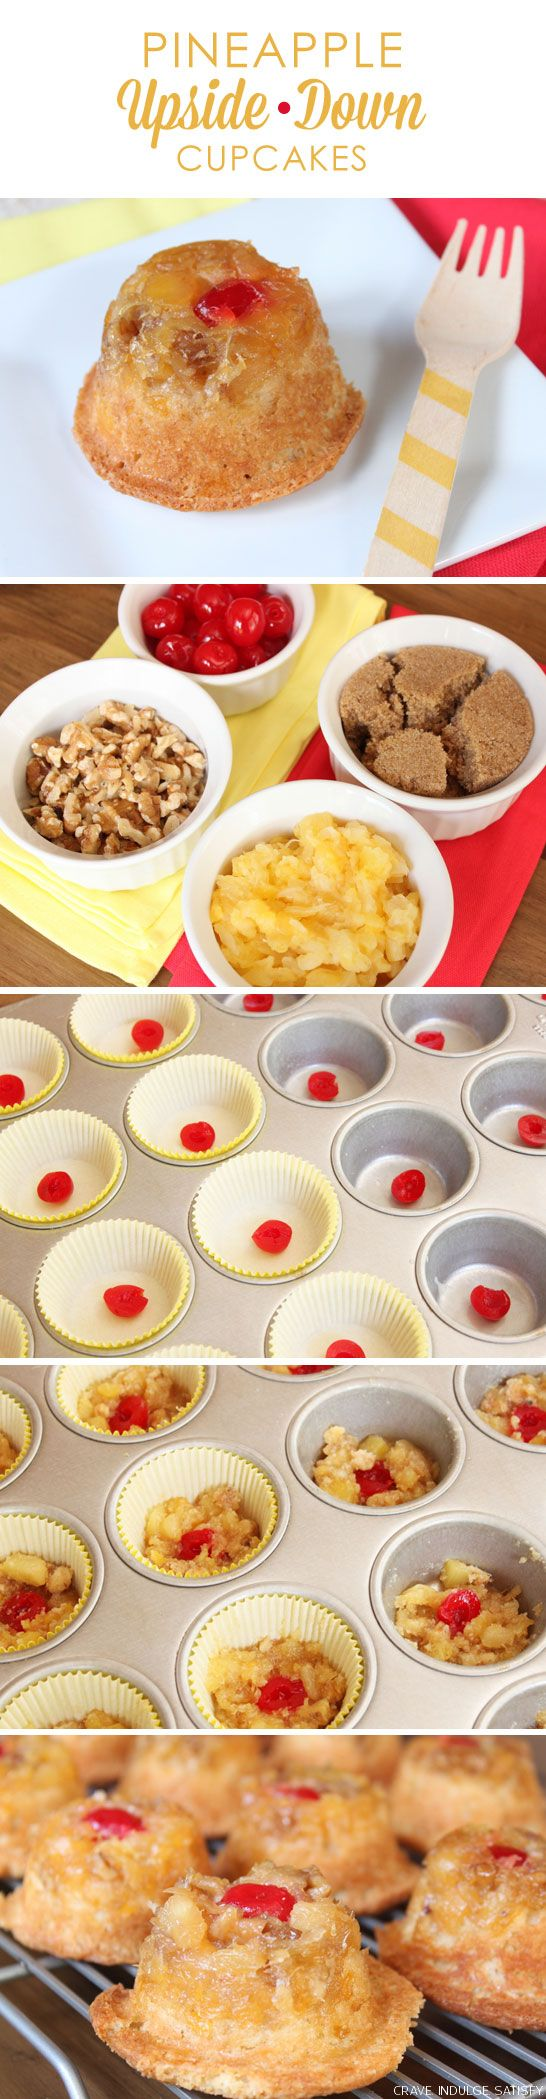 Pineapple Upside-Down Cupcakes Recipe